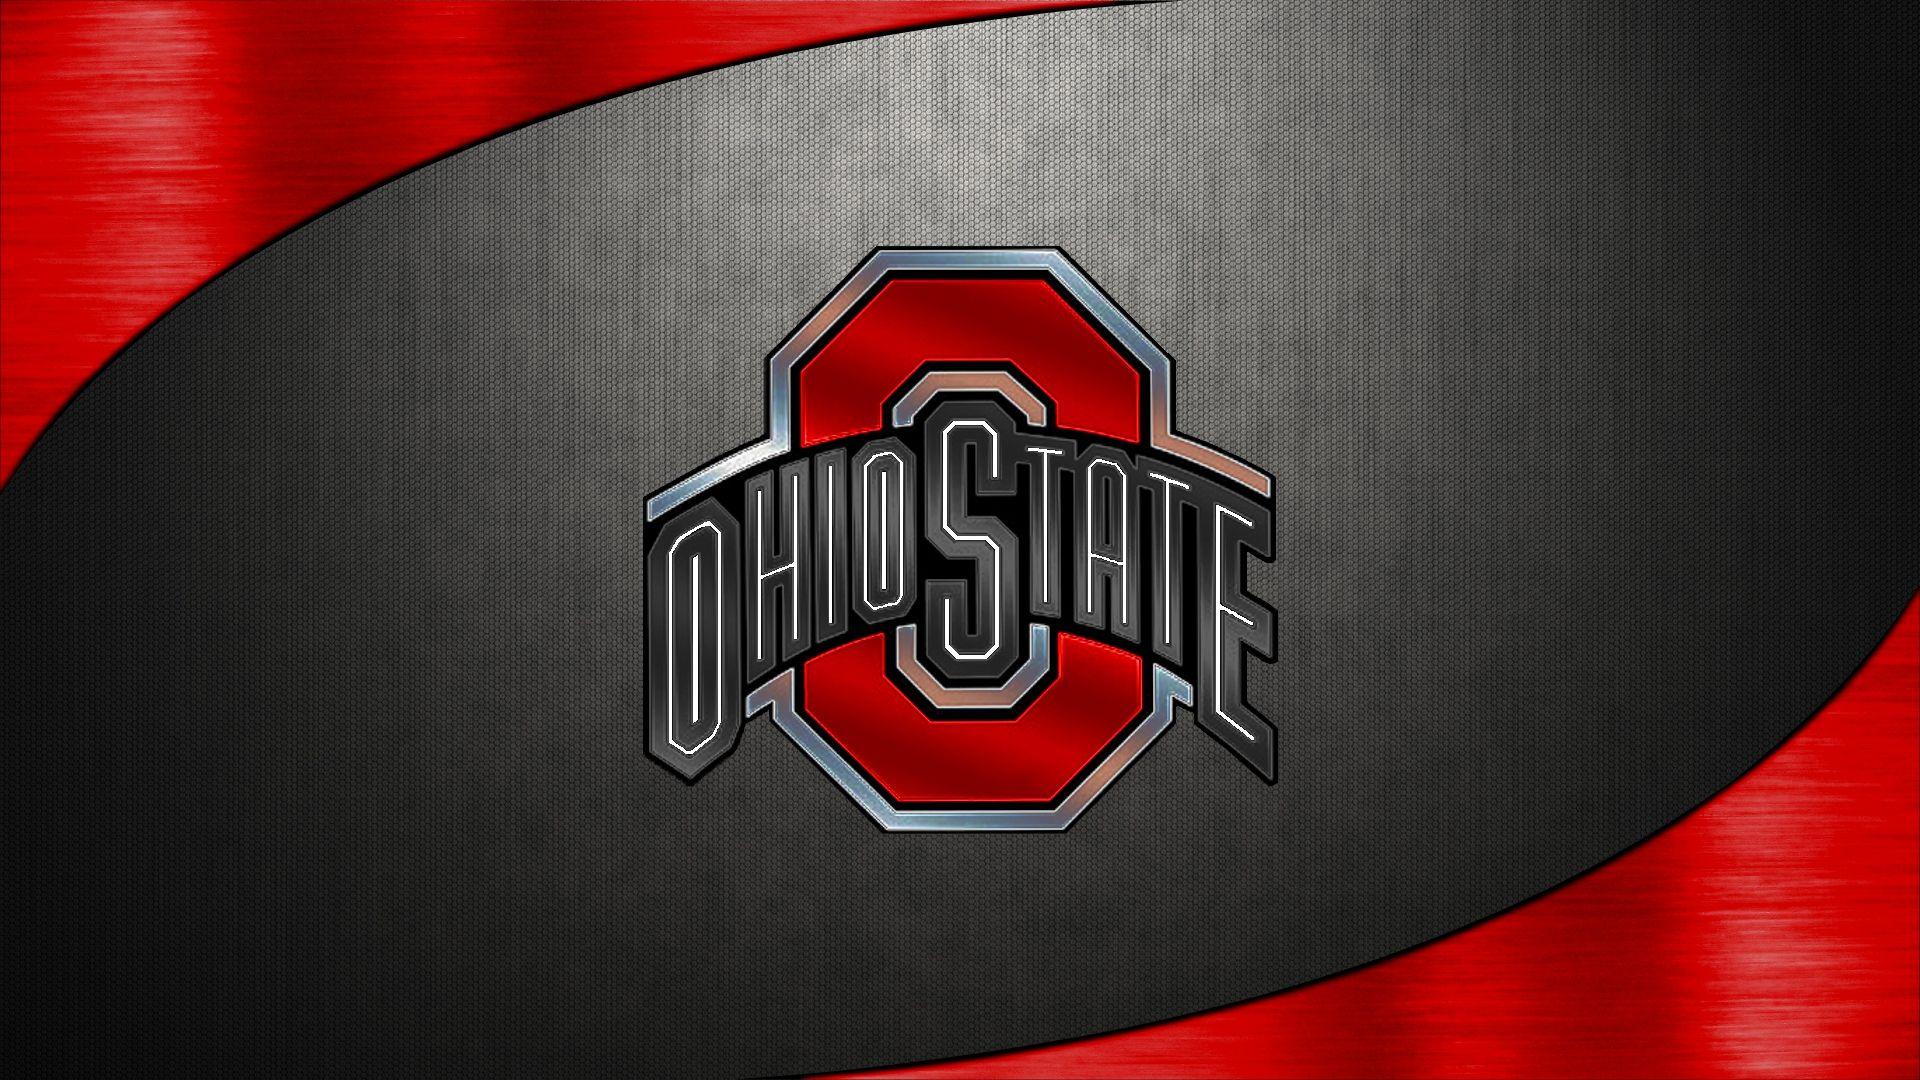 OSU Wallpaper 447 ohiostatefootball Wallpaper Ohio